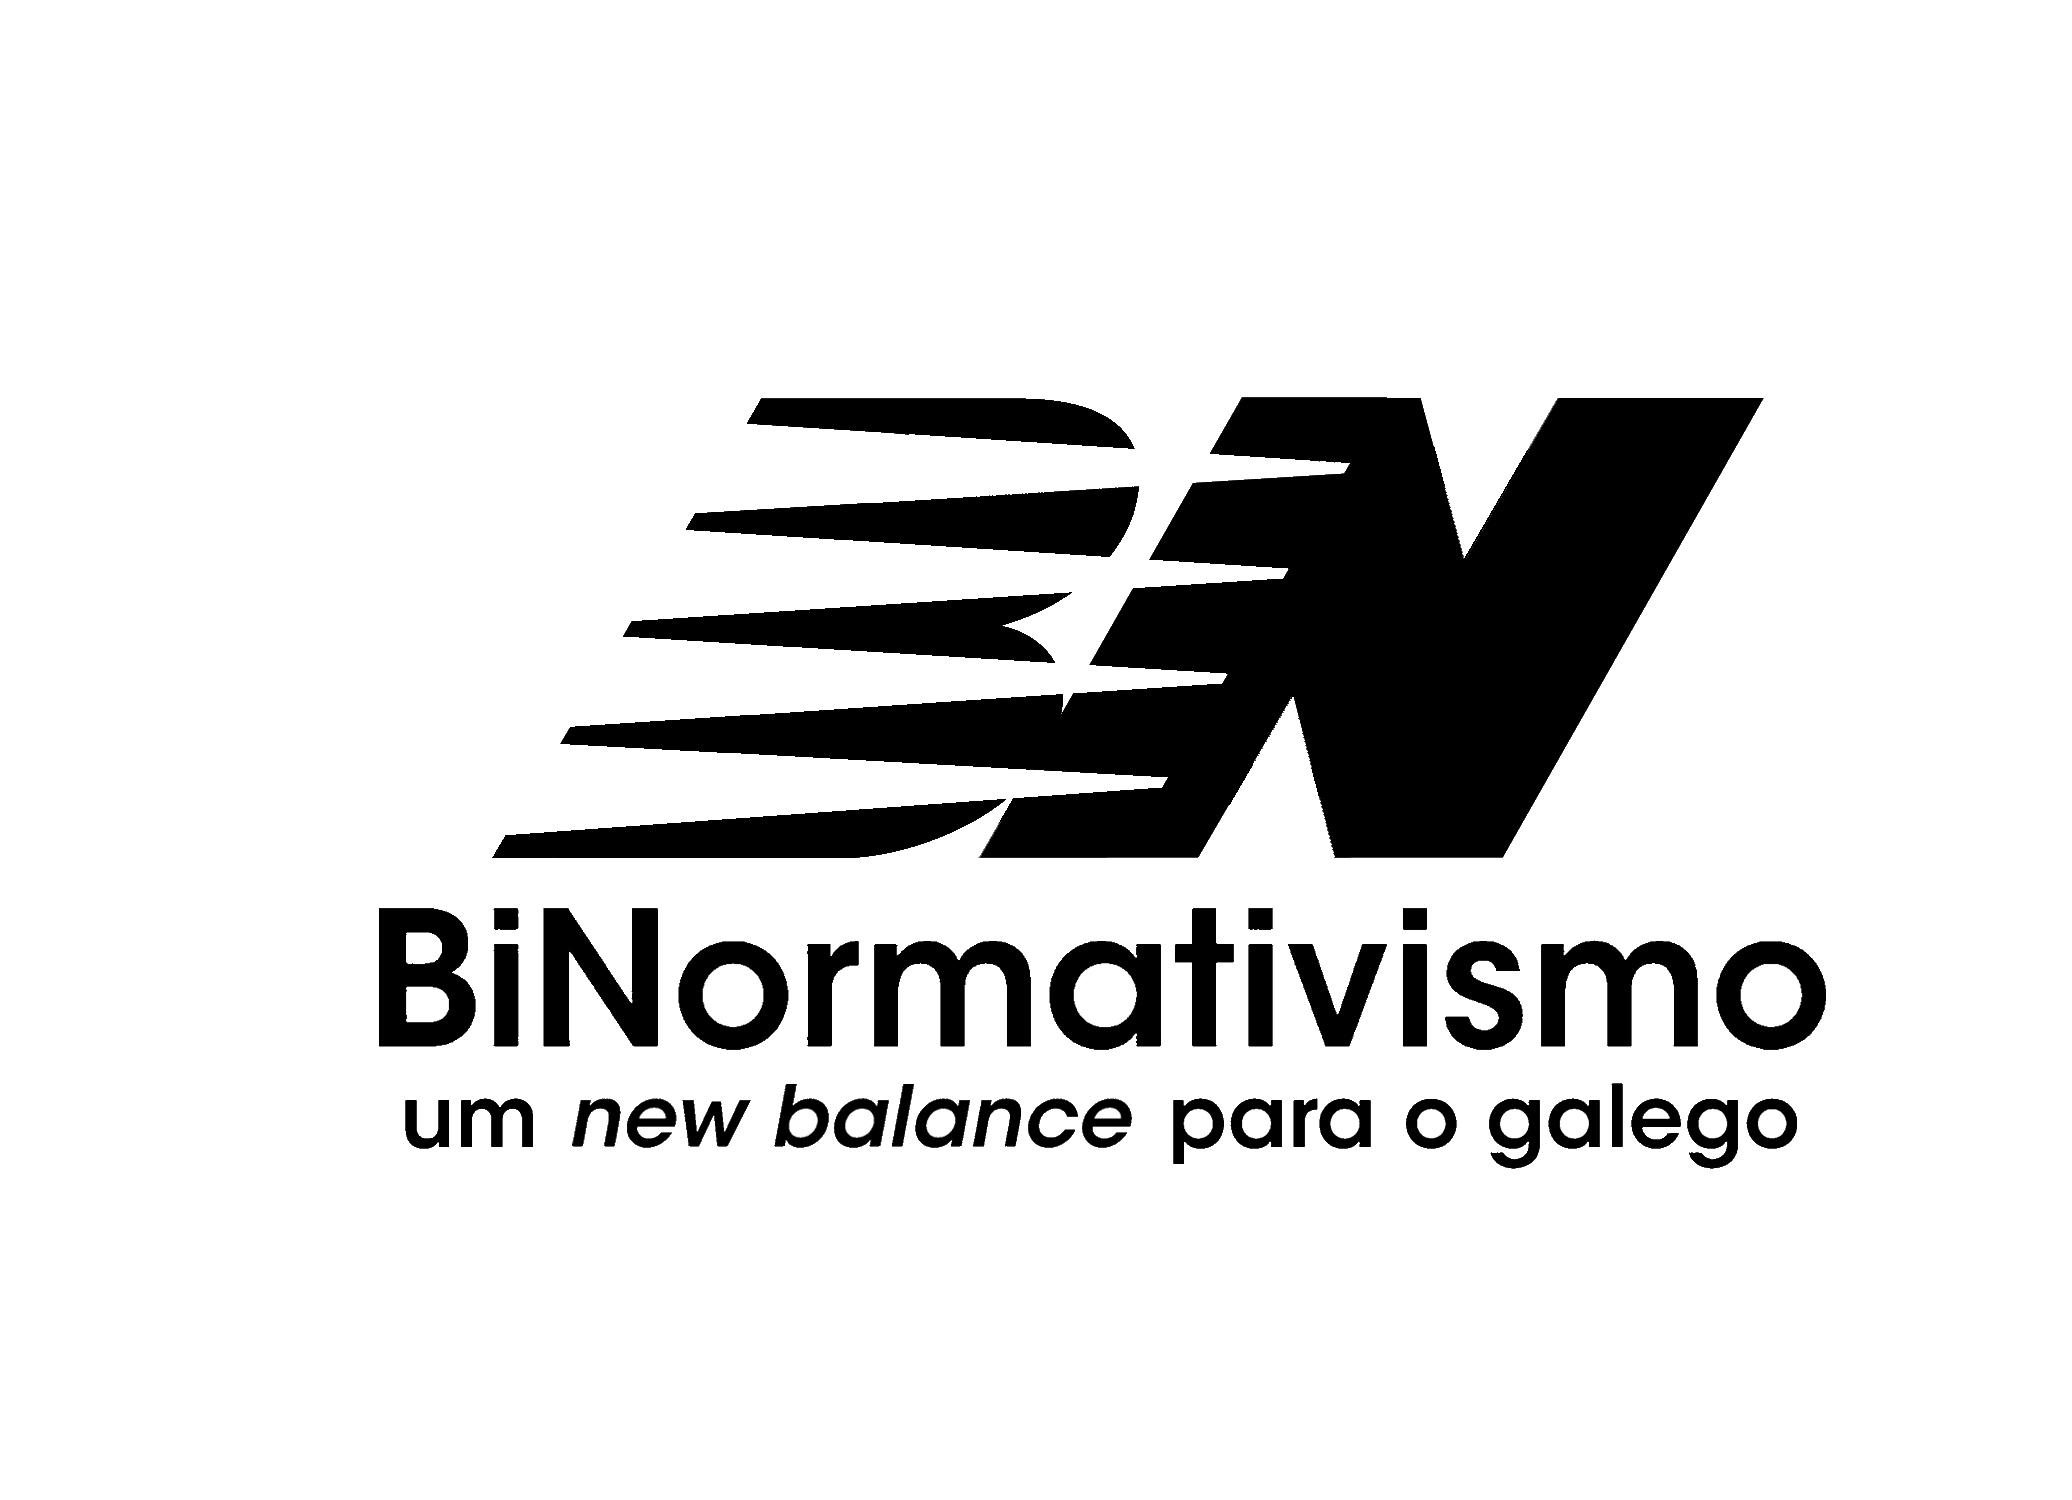 binormativismo logo 2